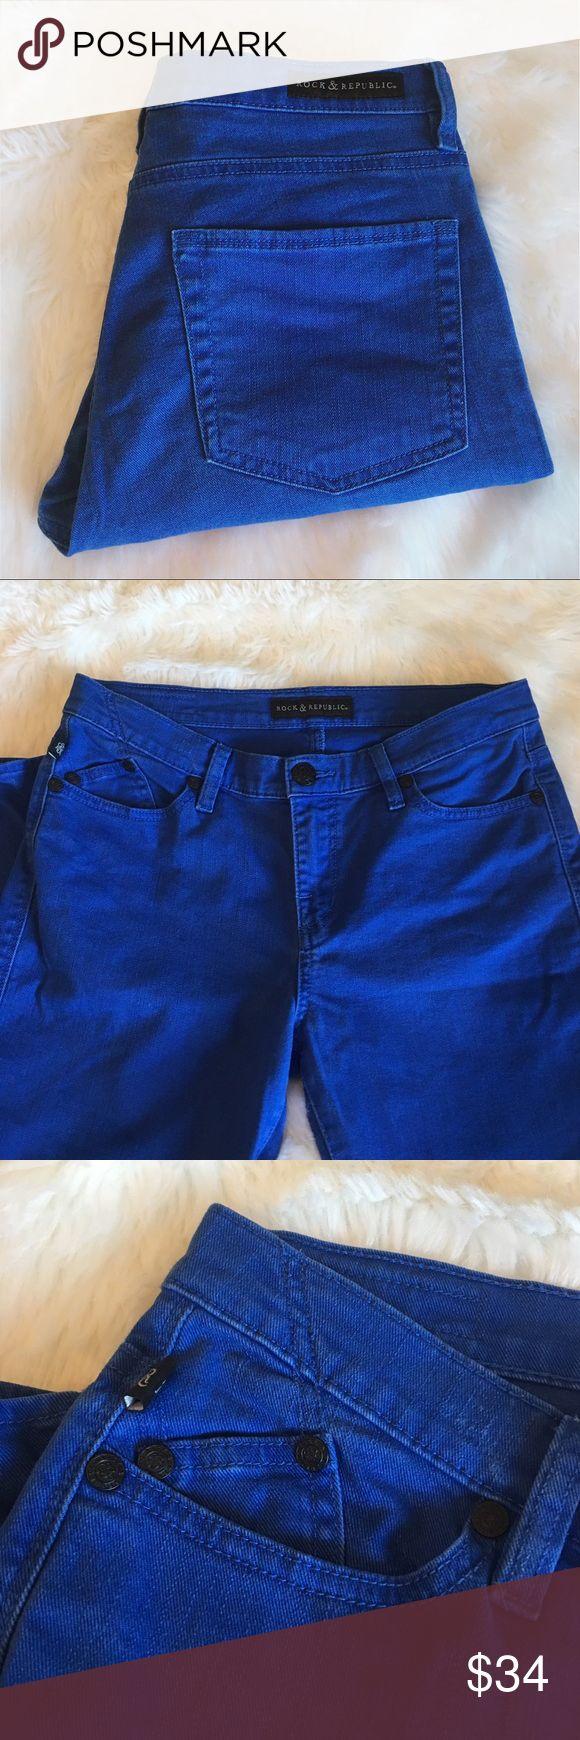 "Rock & Republic   Blue Hamburg Cropped Skinny Jean Good condition. Rock & Republic Hamburg jeans. Royal blue denim. Slight stretch - 98% cotton / 2% spandex. Size 12. Waist 16.5"". Inseam 26"". Leg opening 5.5"". Rise 9"". Hips 18"". Outseam 36"". No trades, offers welcome. Rock & Republic Jeans Skinny"